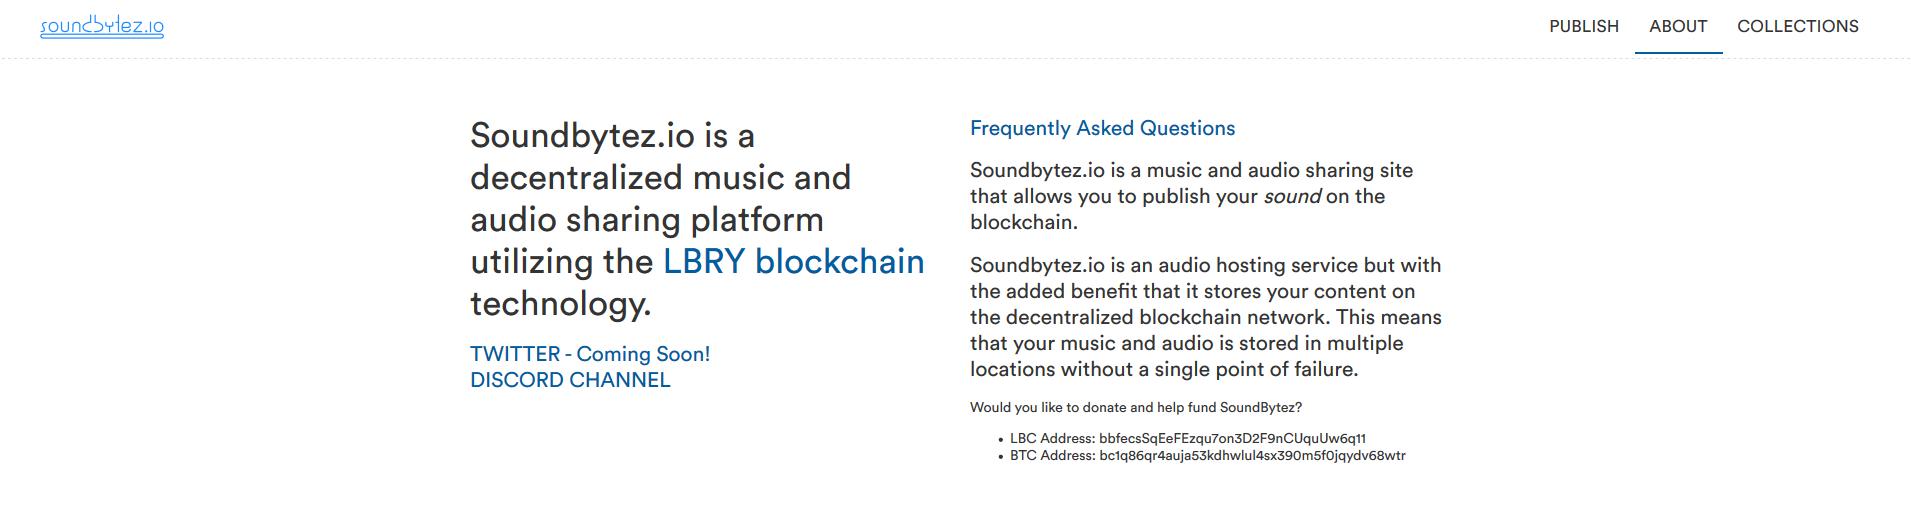 https://soundbytez.io